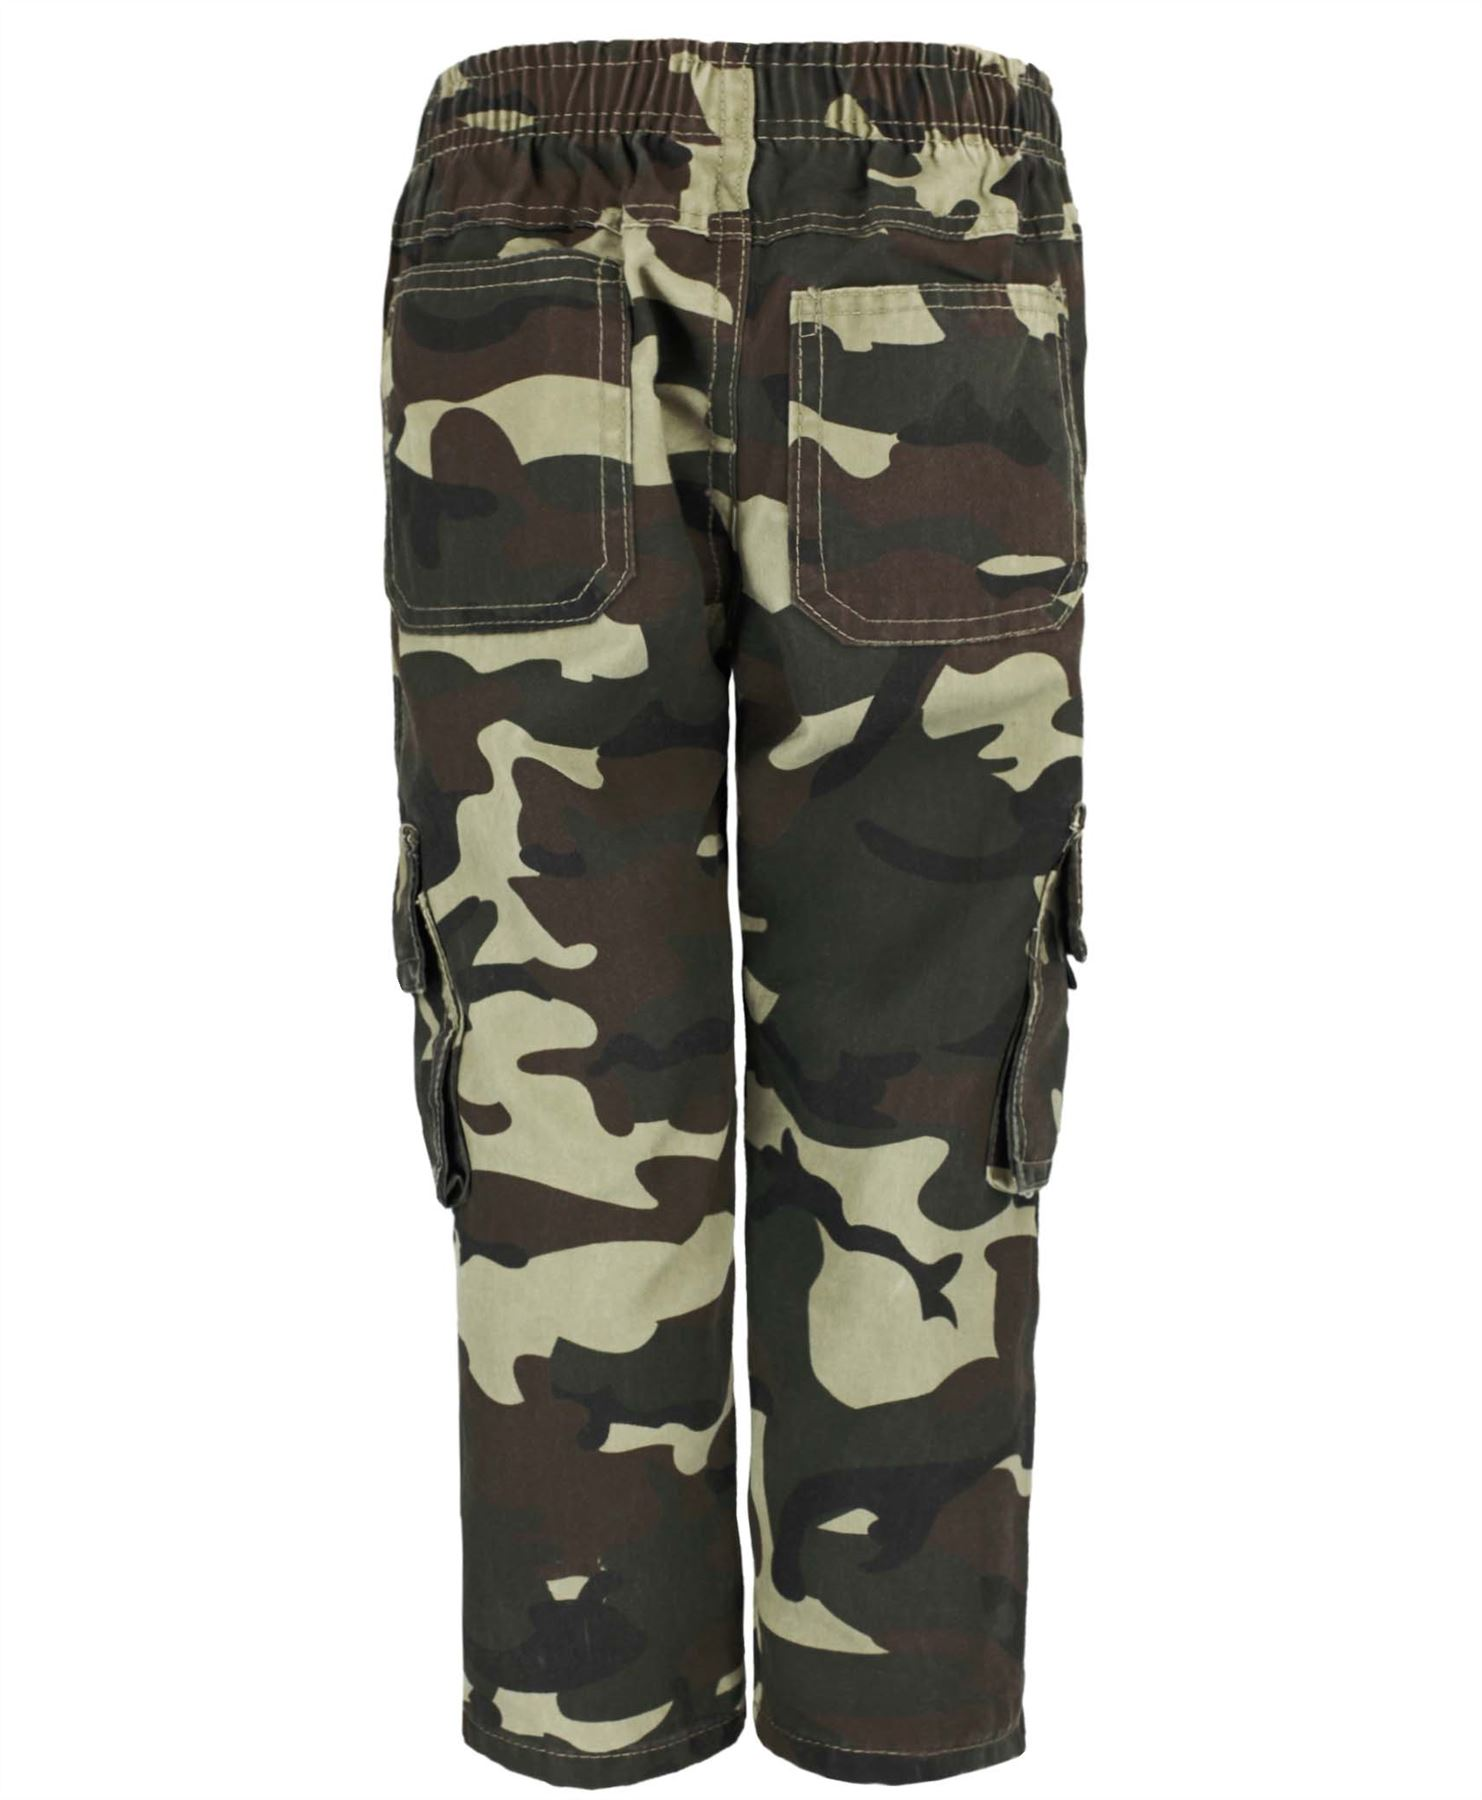 Kids-multipocket-camouflage-pantalon-garcons-armee-imprimer-cargo-combat-pantalon-4-14-ans miniature 7